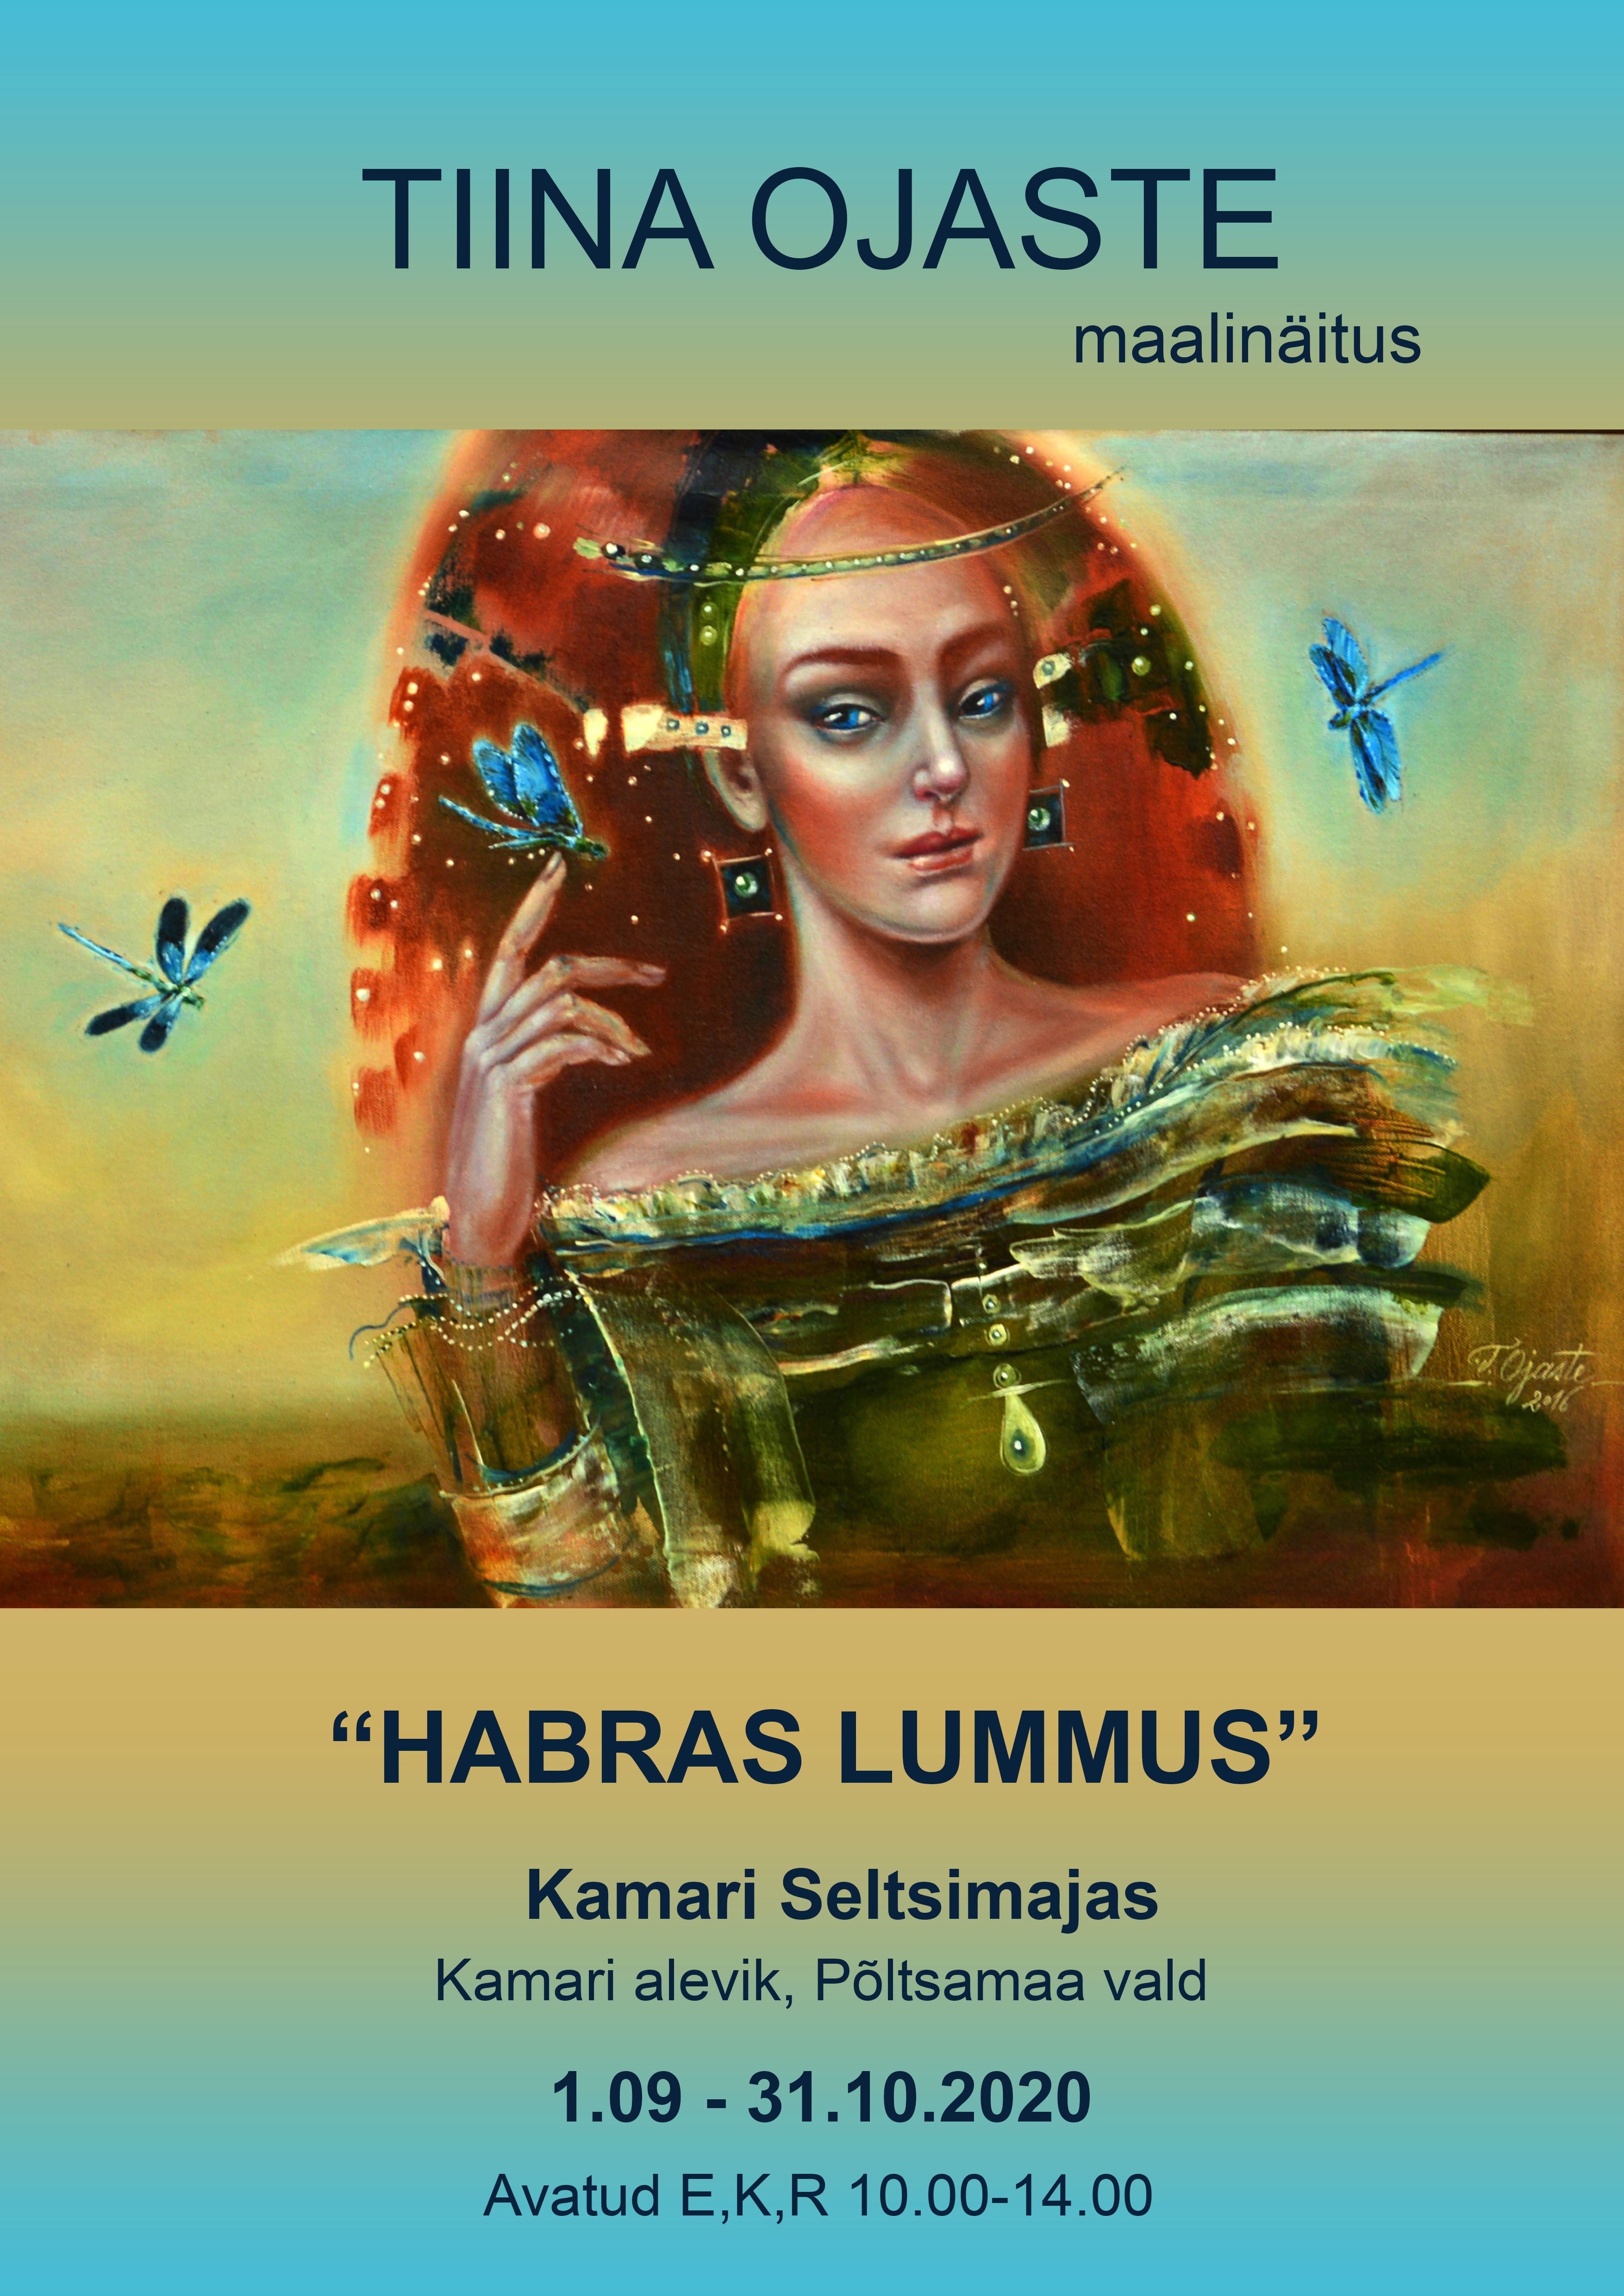 HABRAS LUMMUSKamari Seltsimaja-2020